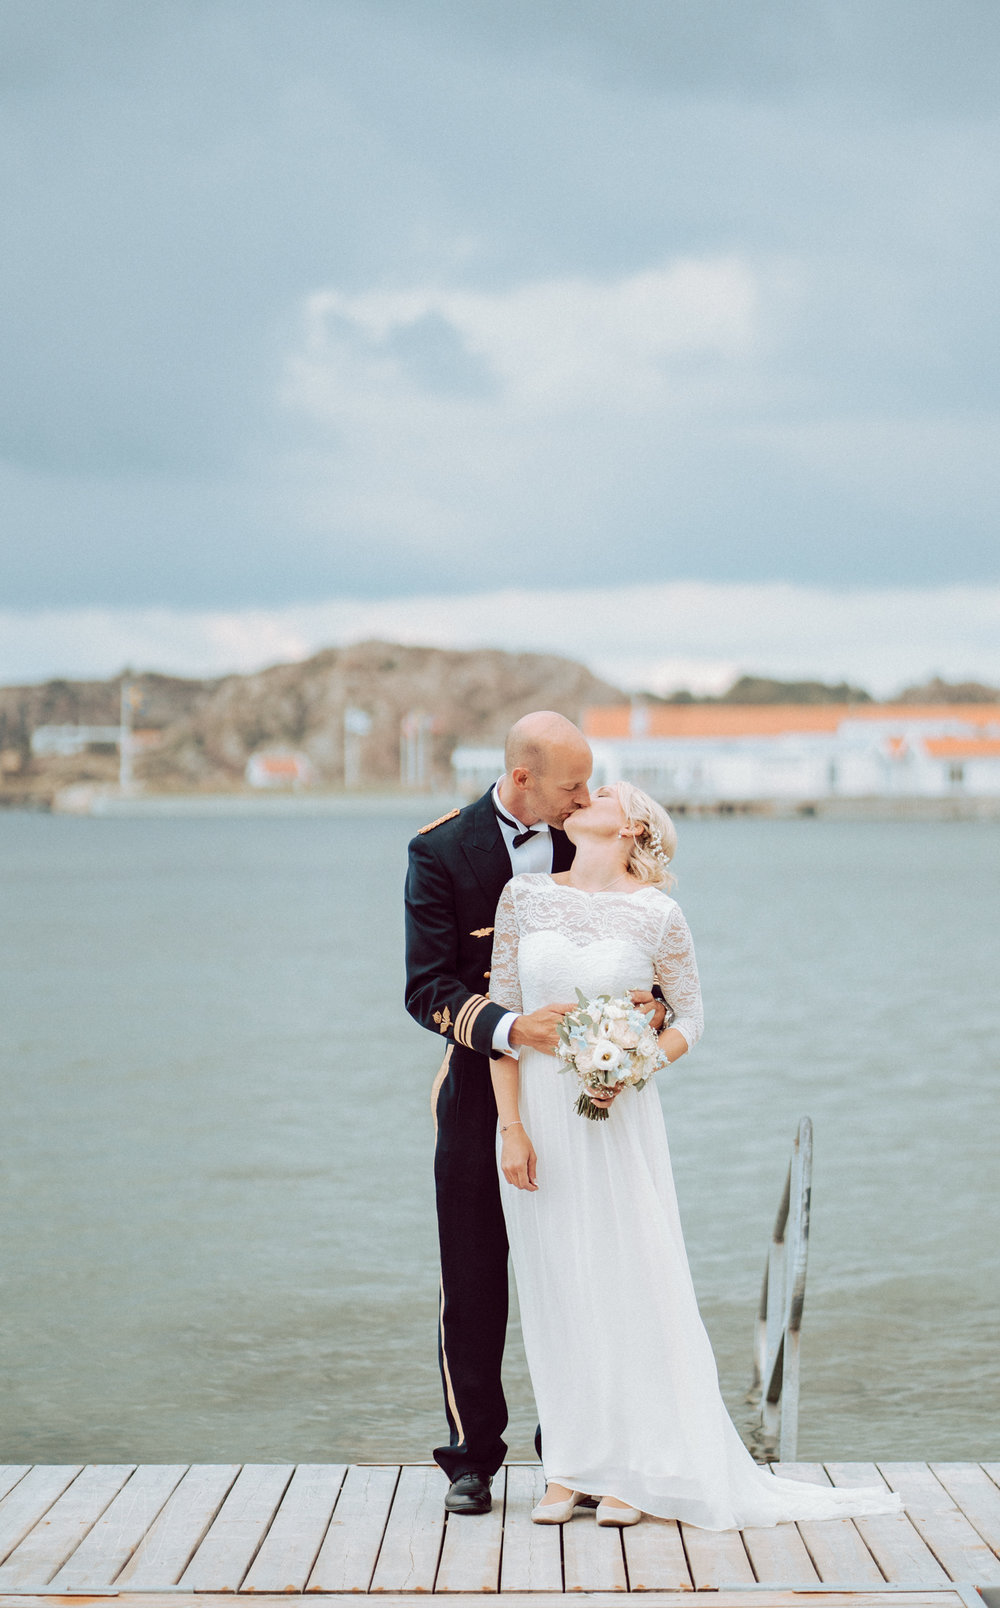 Bröllop-fotografmaxnorin.se-MariaMarcus-368.JPG